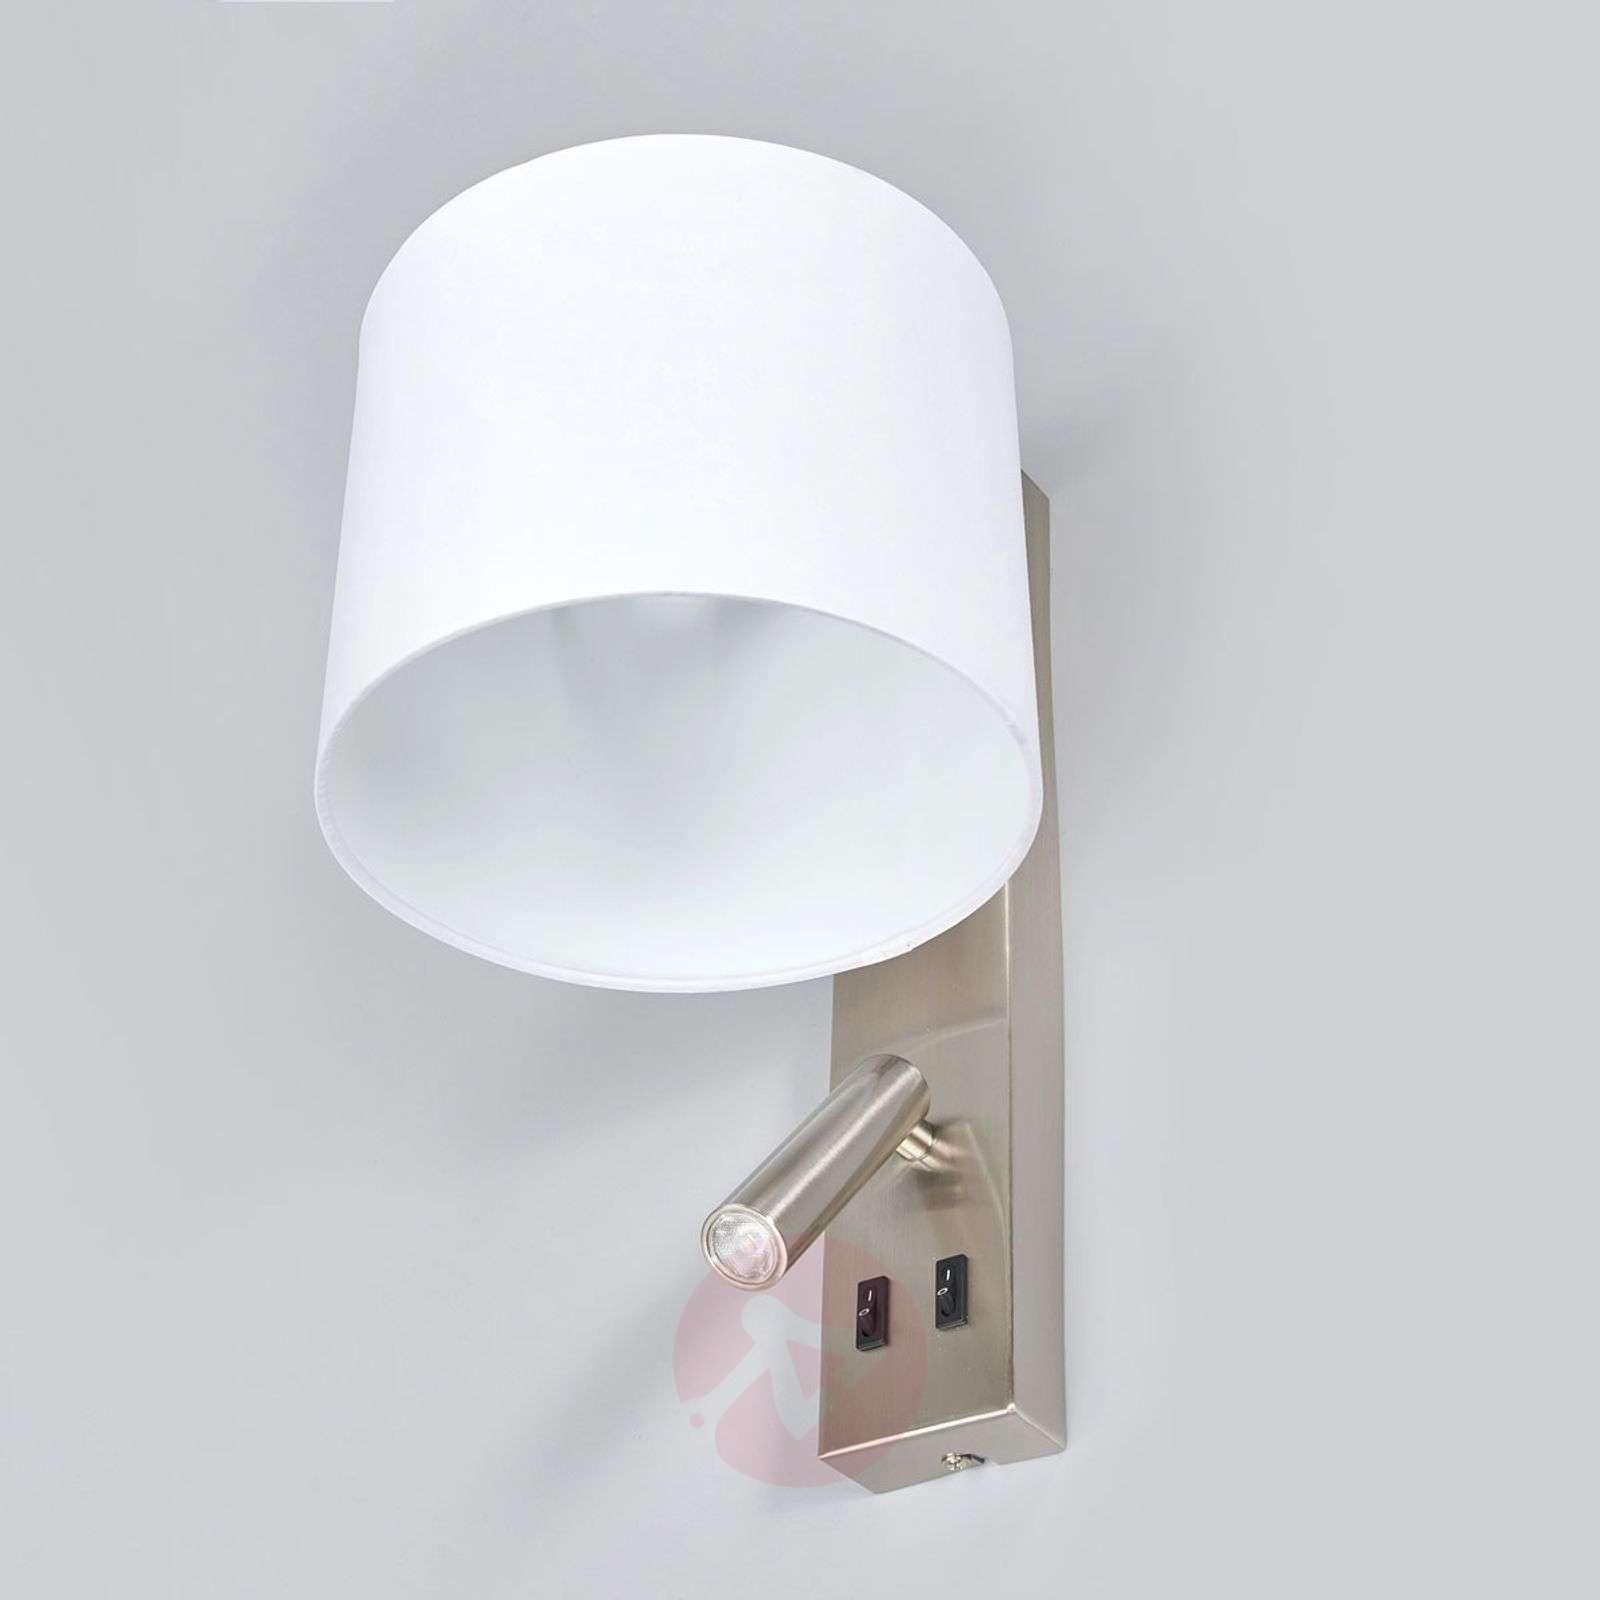 White wall lamp Mavis with LED reading light-9641099-02